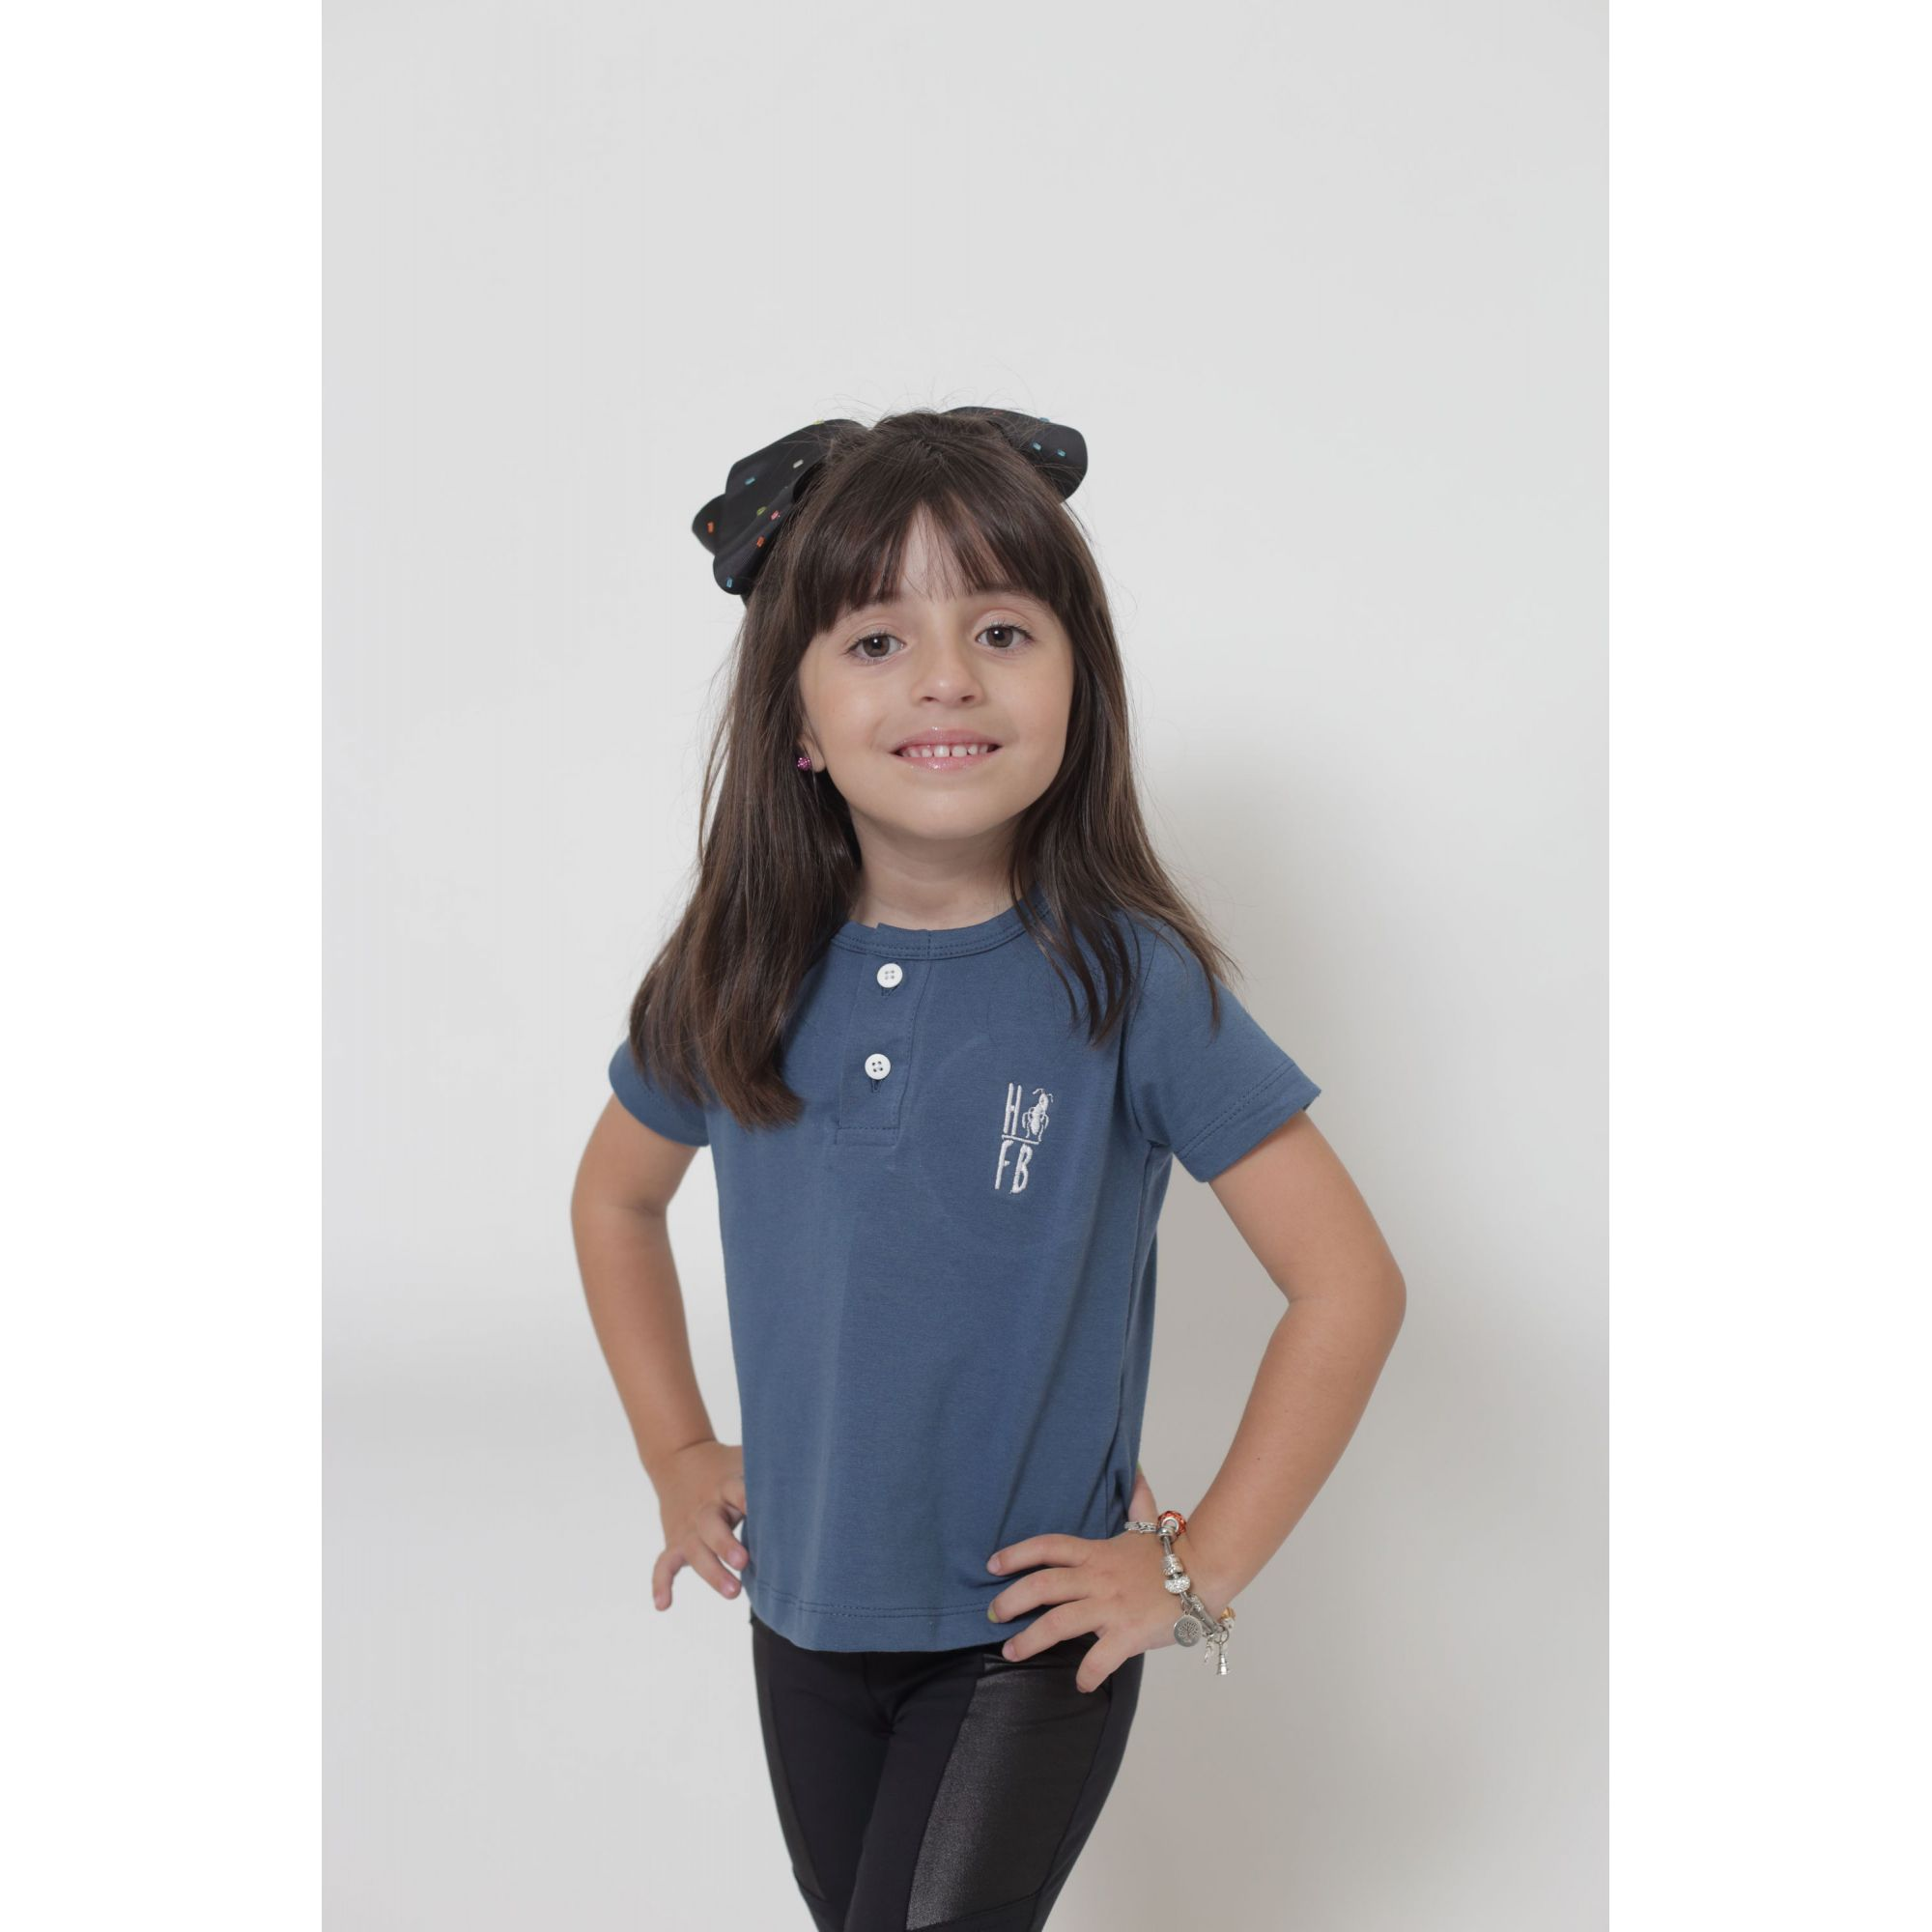 PAI E FILHA > 02 T-Shirts ou Body Henley - Azul Petróleo  [Coleção Tal Pai Tal Filha]  - Heitor Fashion Brazil